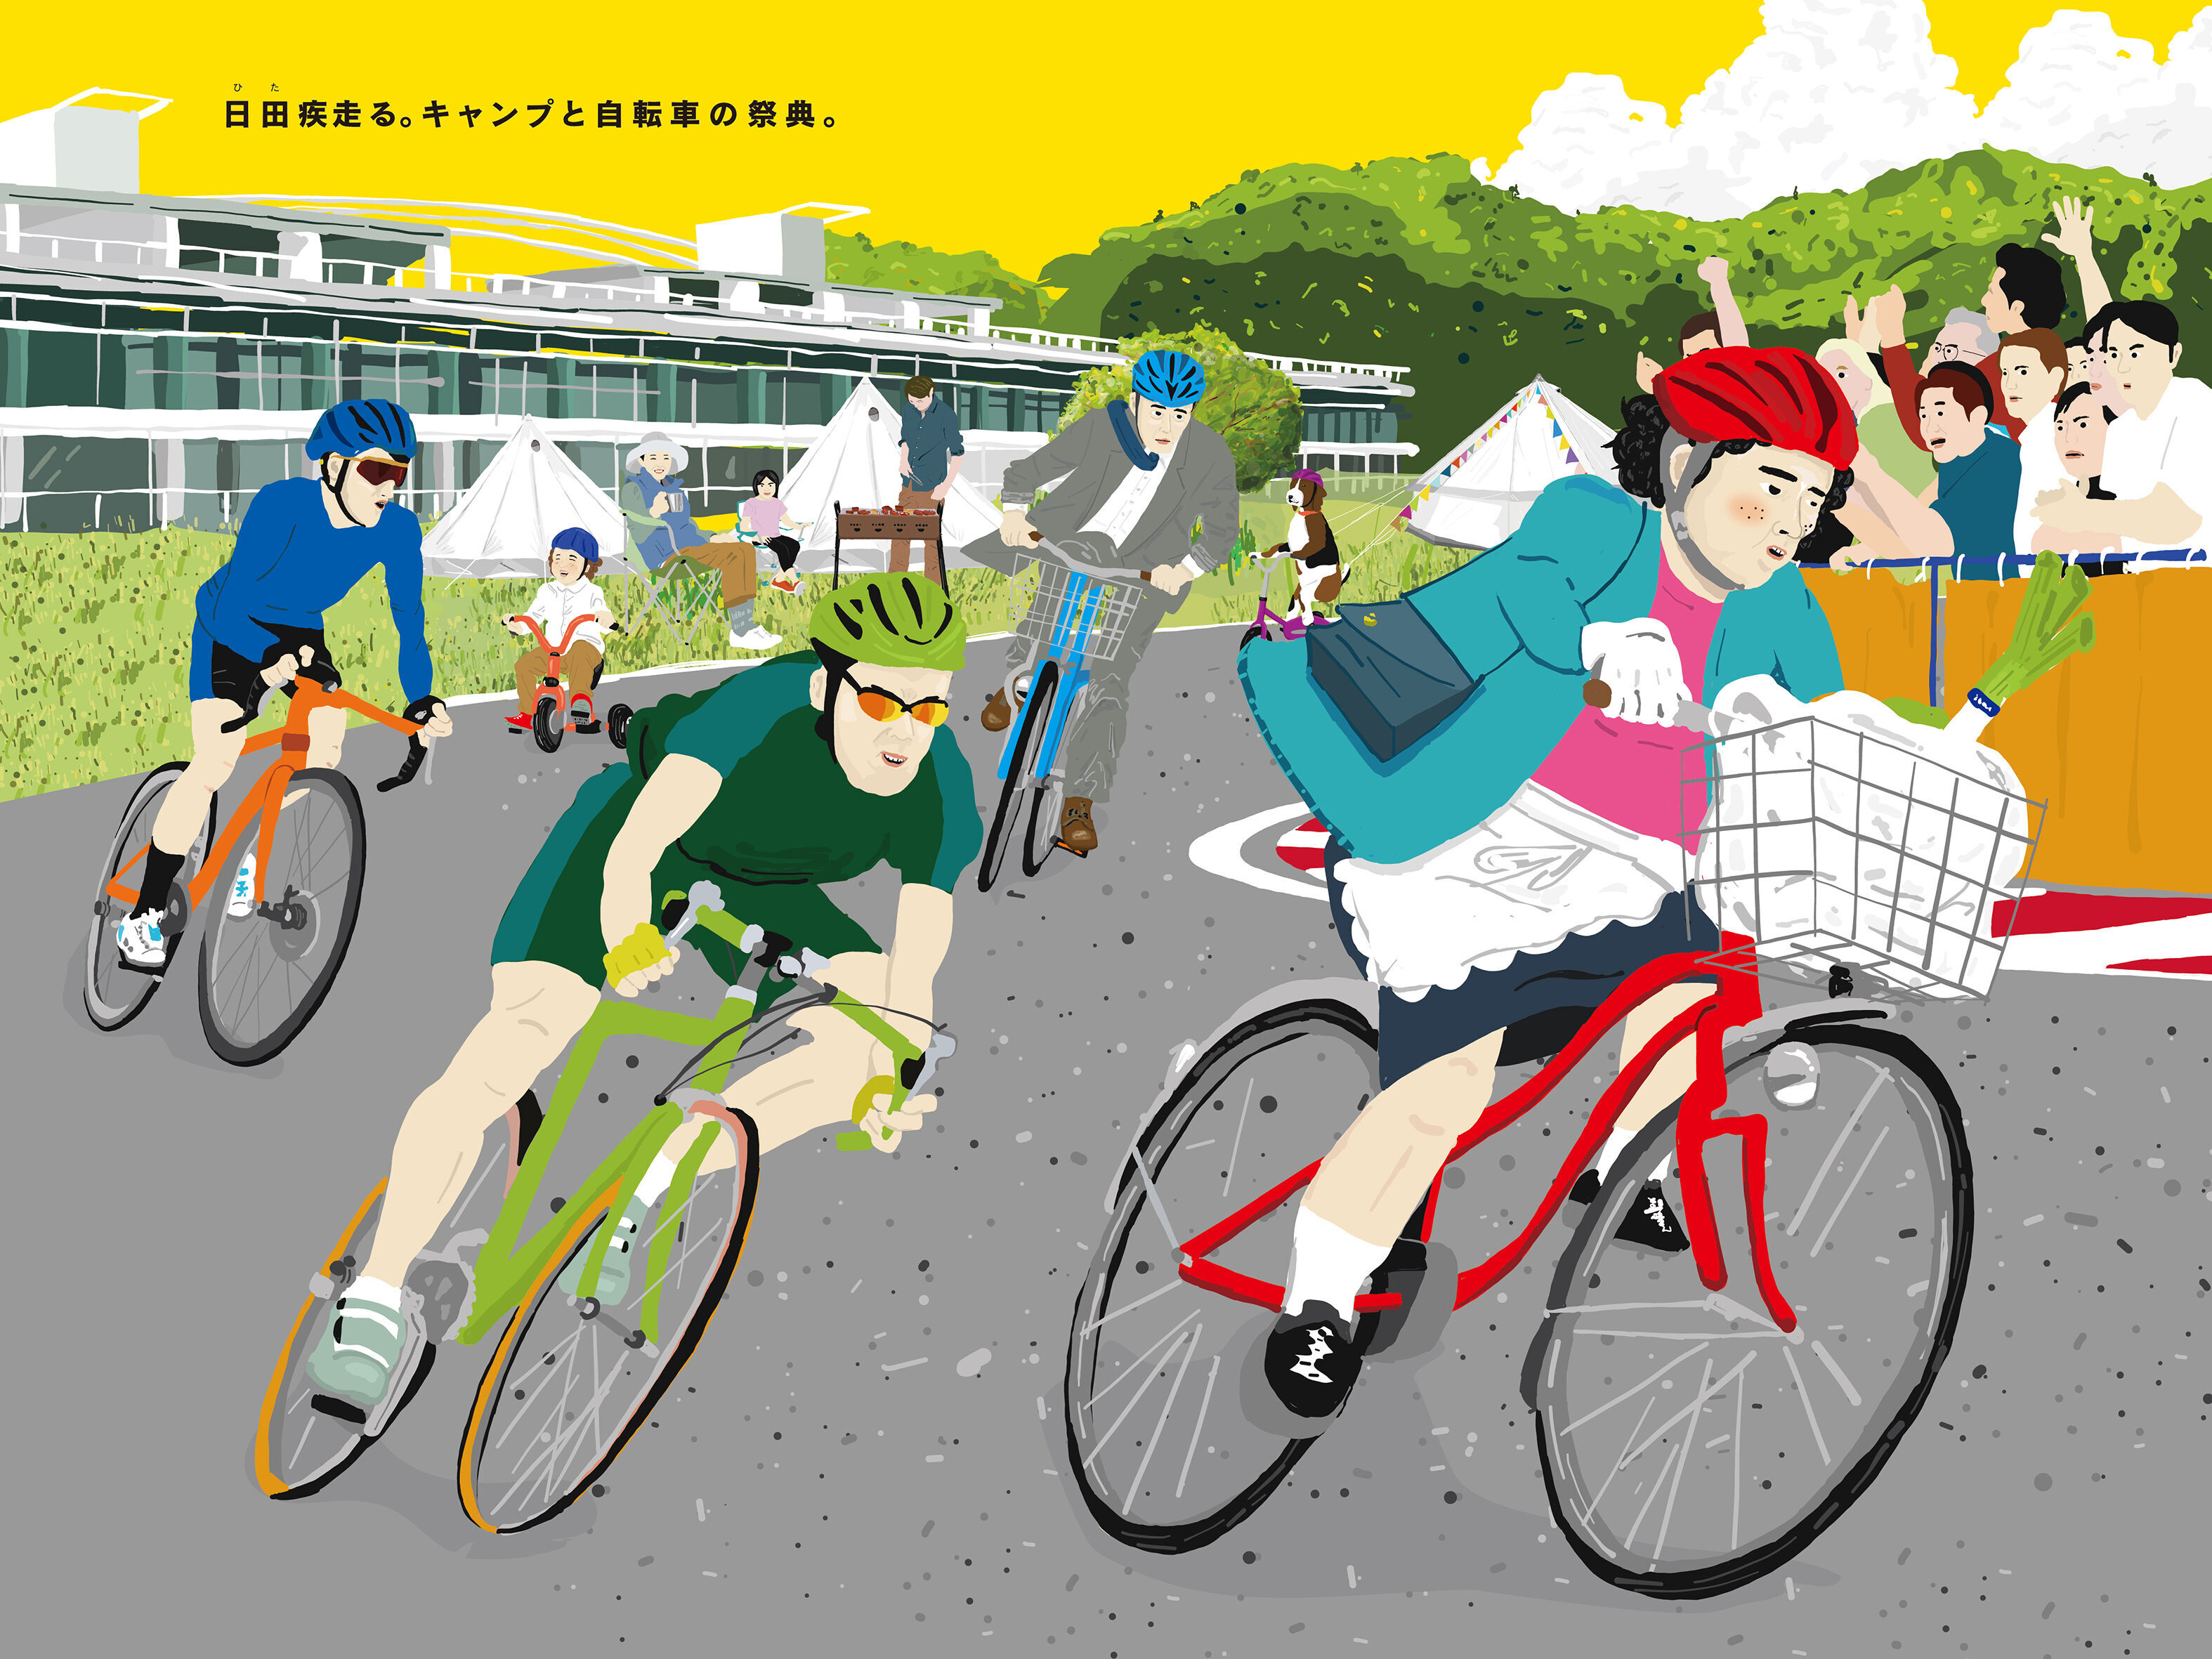 JCLホビーレース【コーユーレンティアオートポリス ロードレース(JCL併催)】開催決定